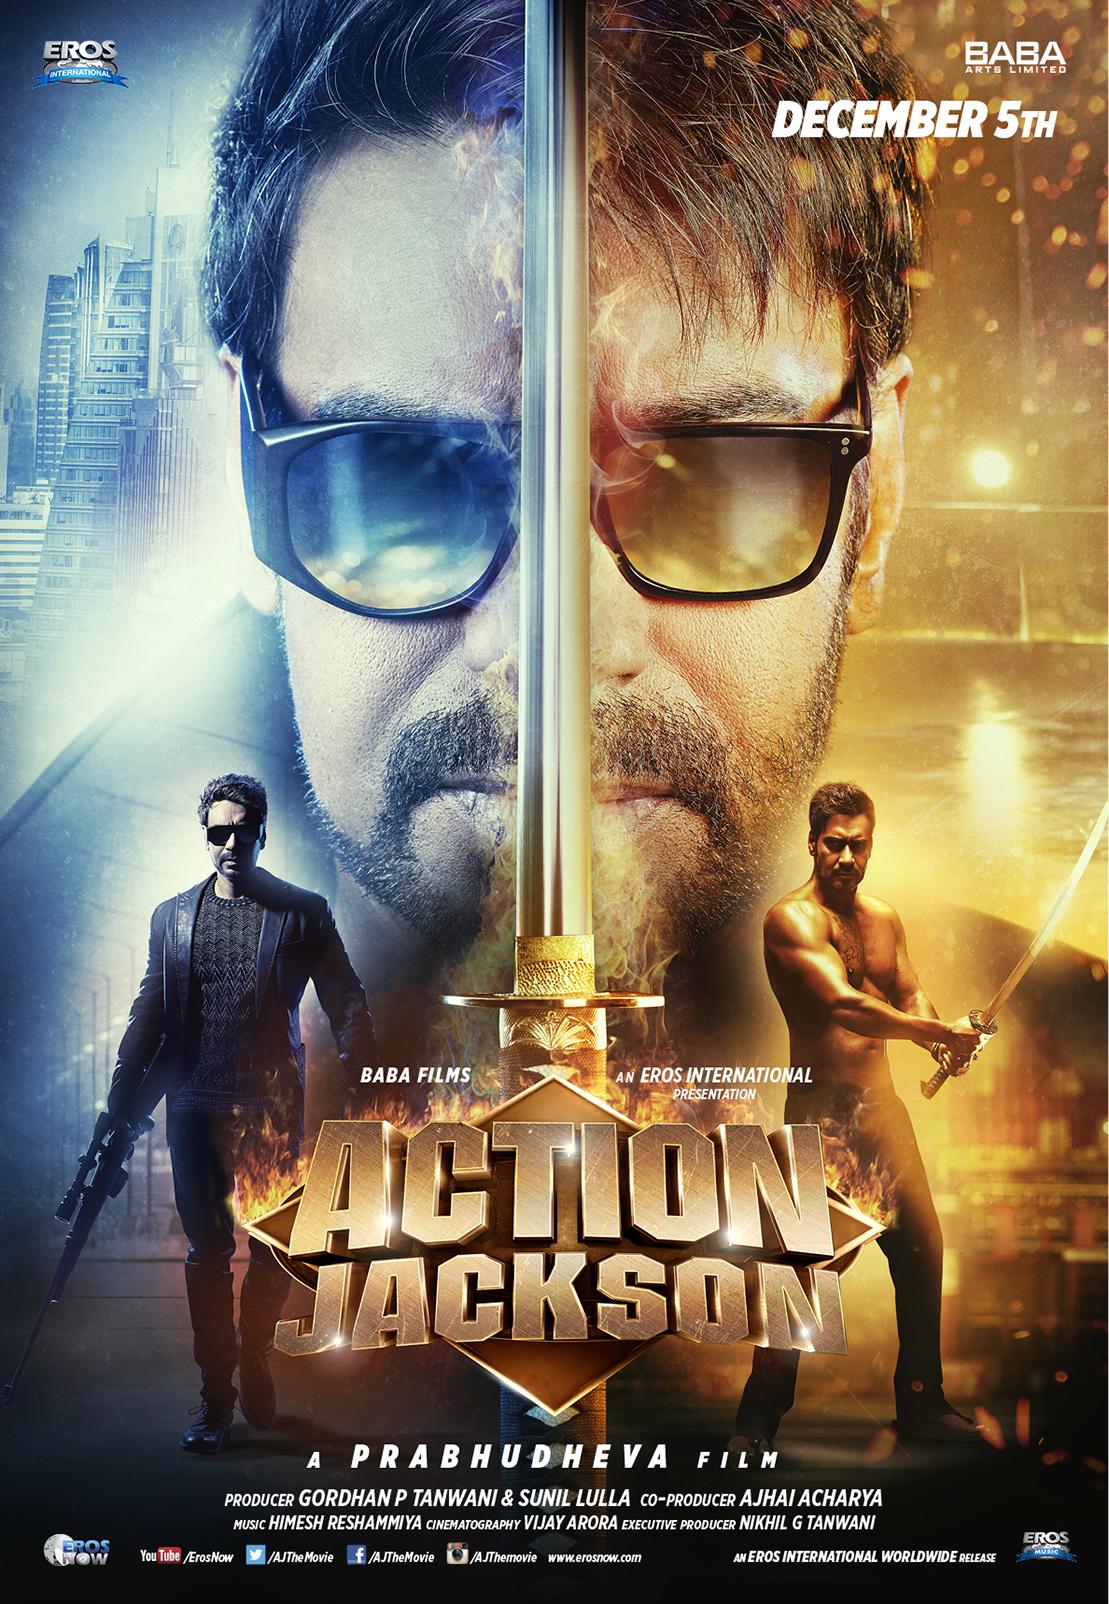 Action jackson regal cinemas Action regal